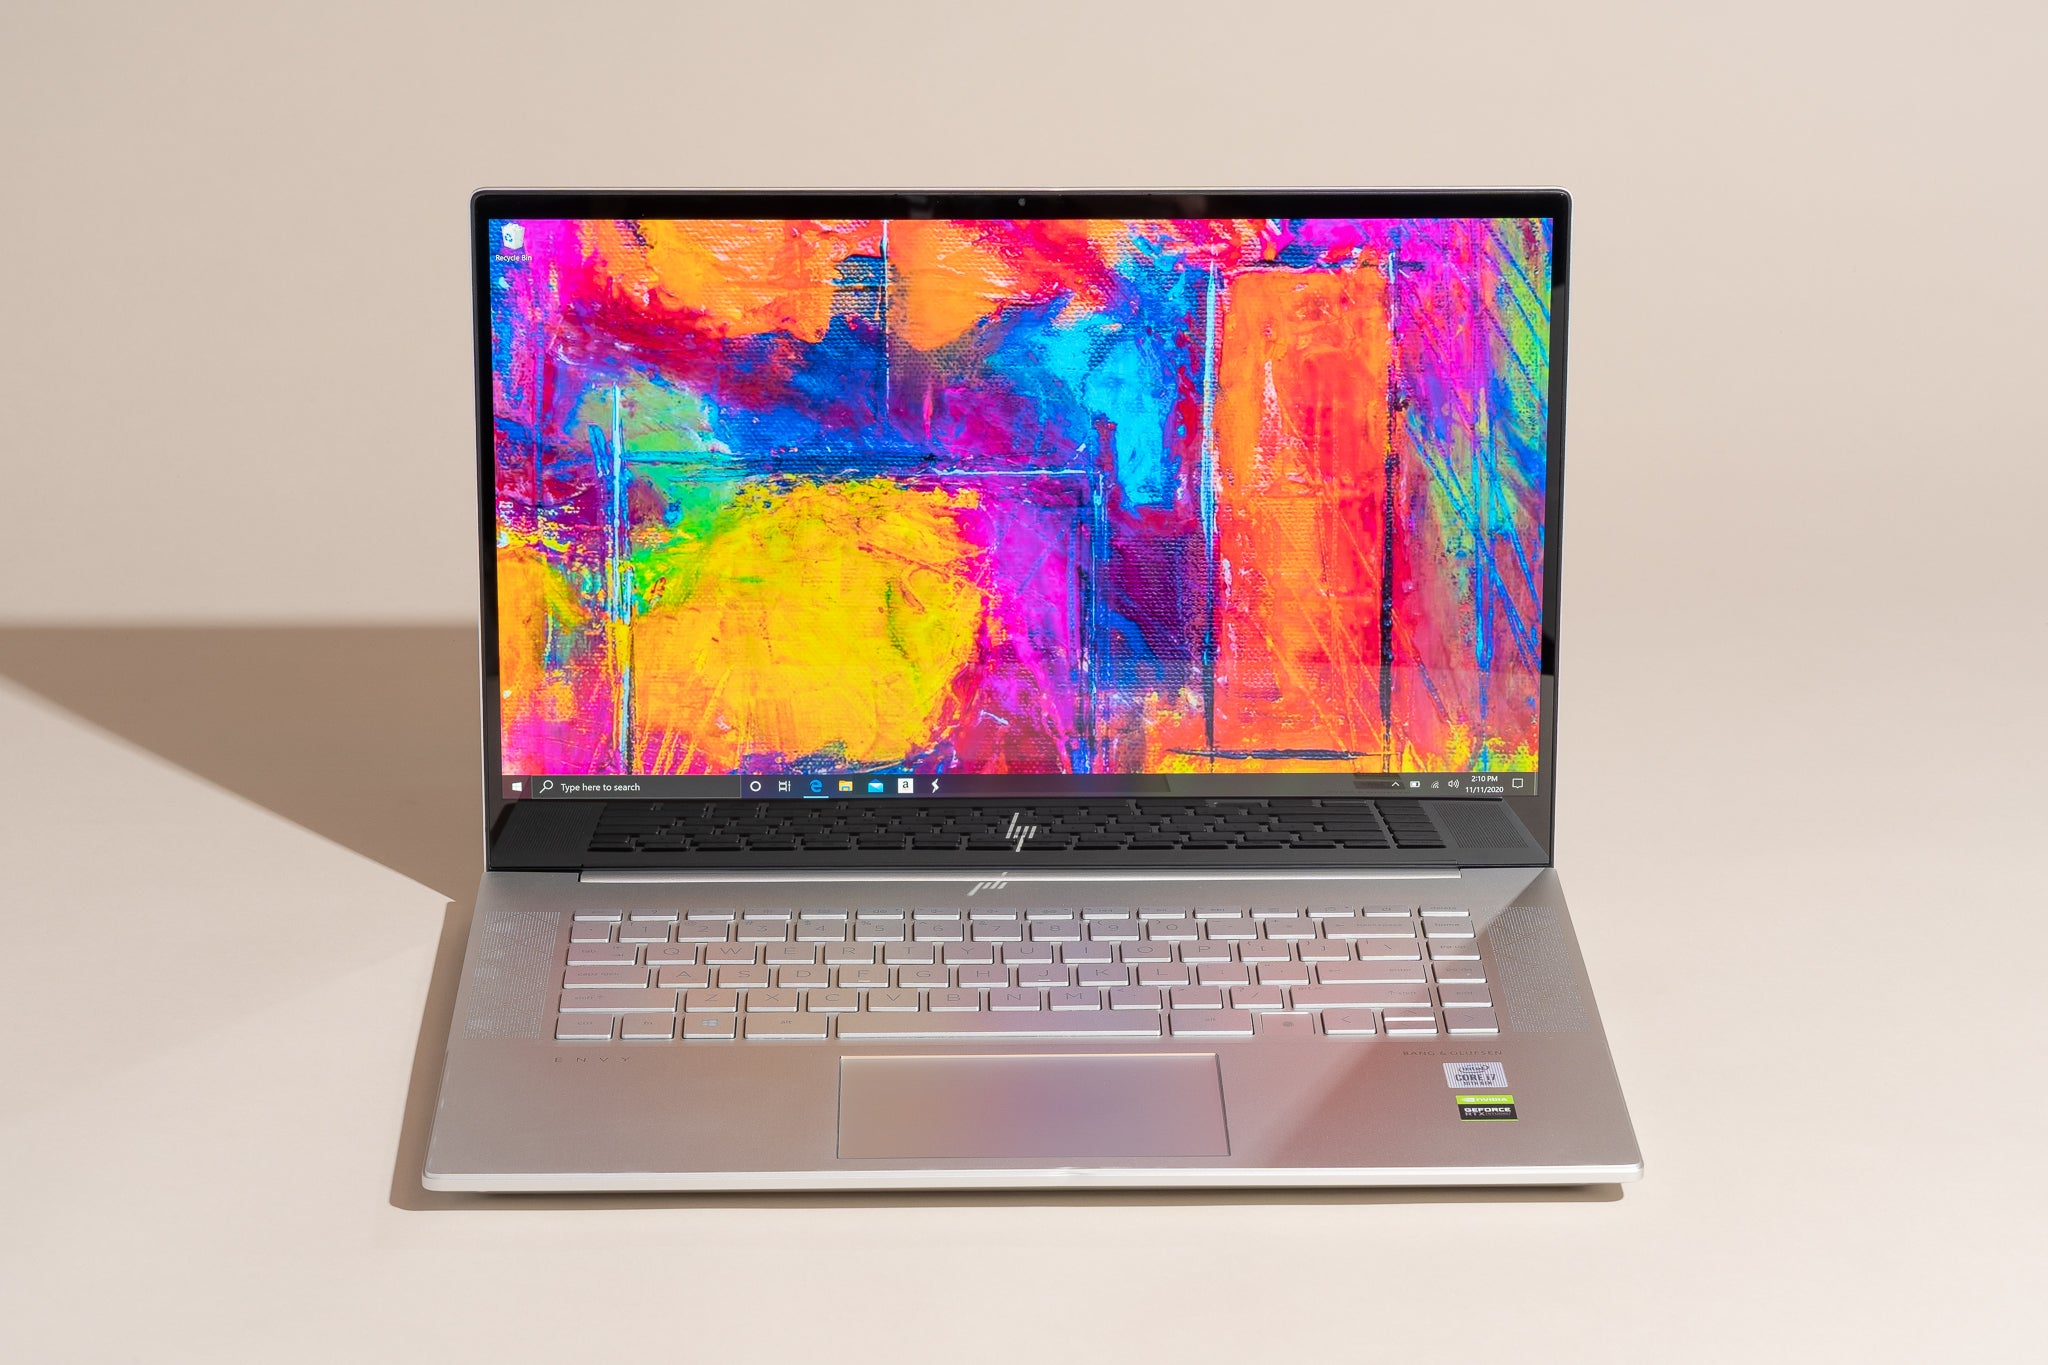 Best Laptop for 4k Playback